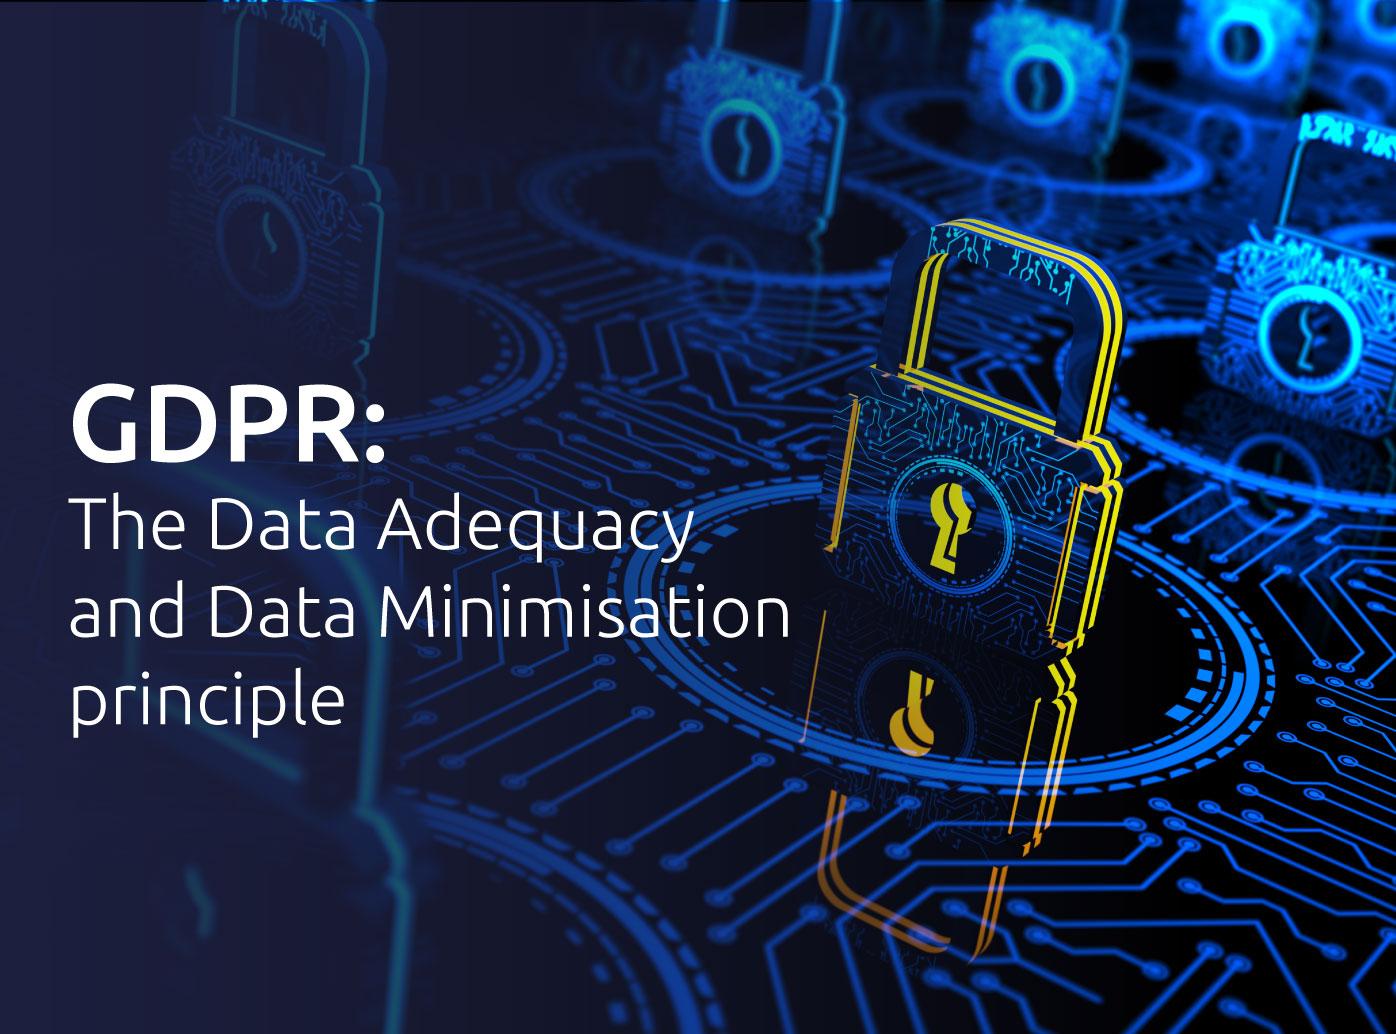 GDPR: the Data Adequacy and Data Minimisation principle